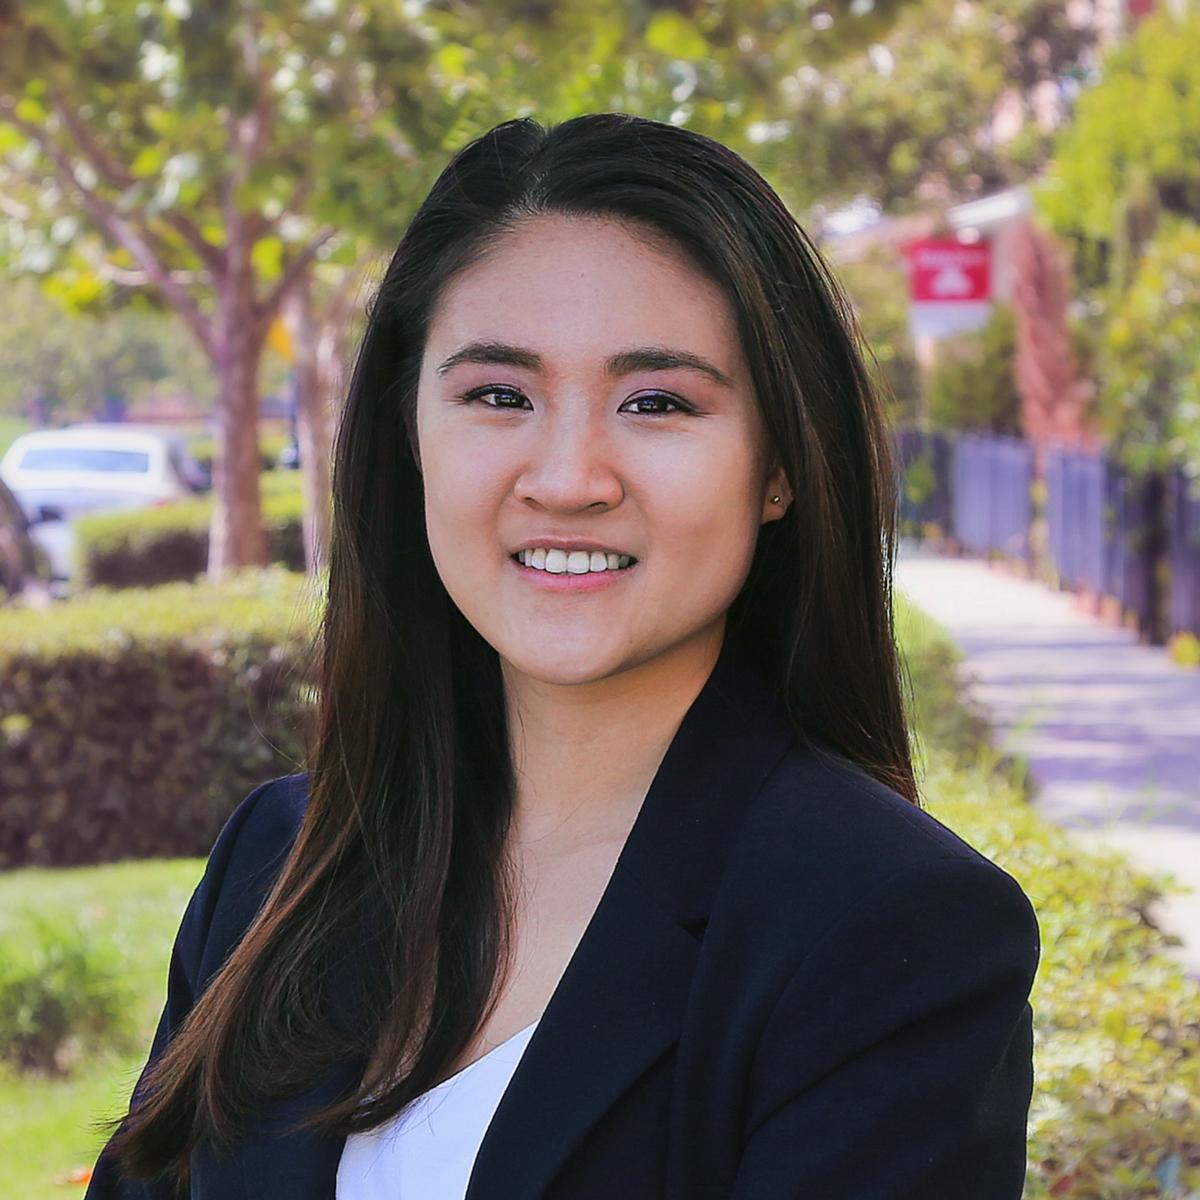 Pharmacy-Student-Katherine-Hsu-03